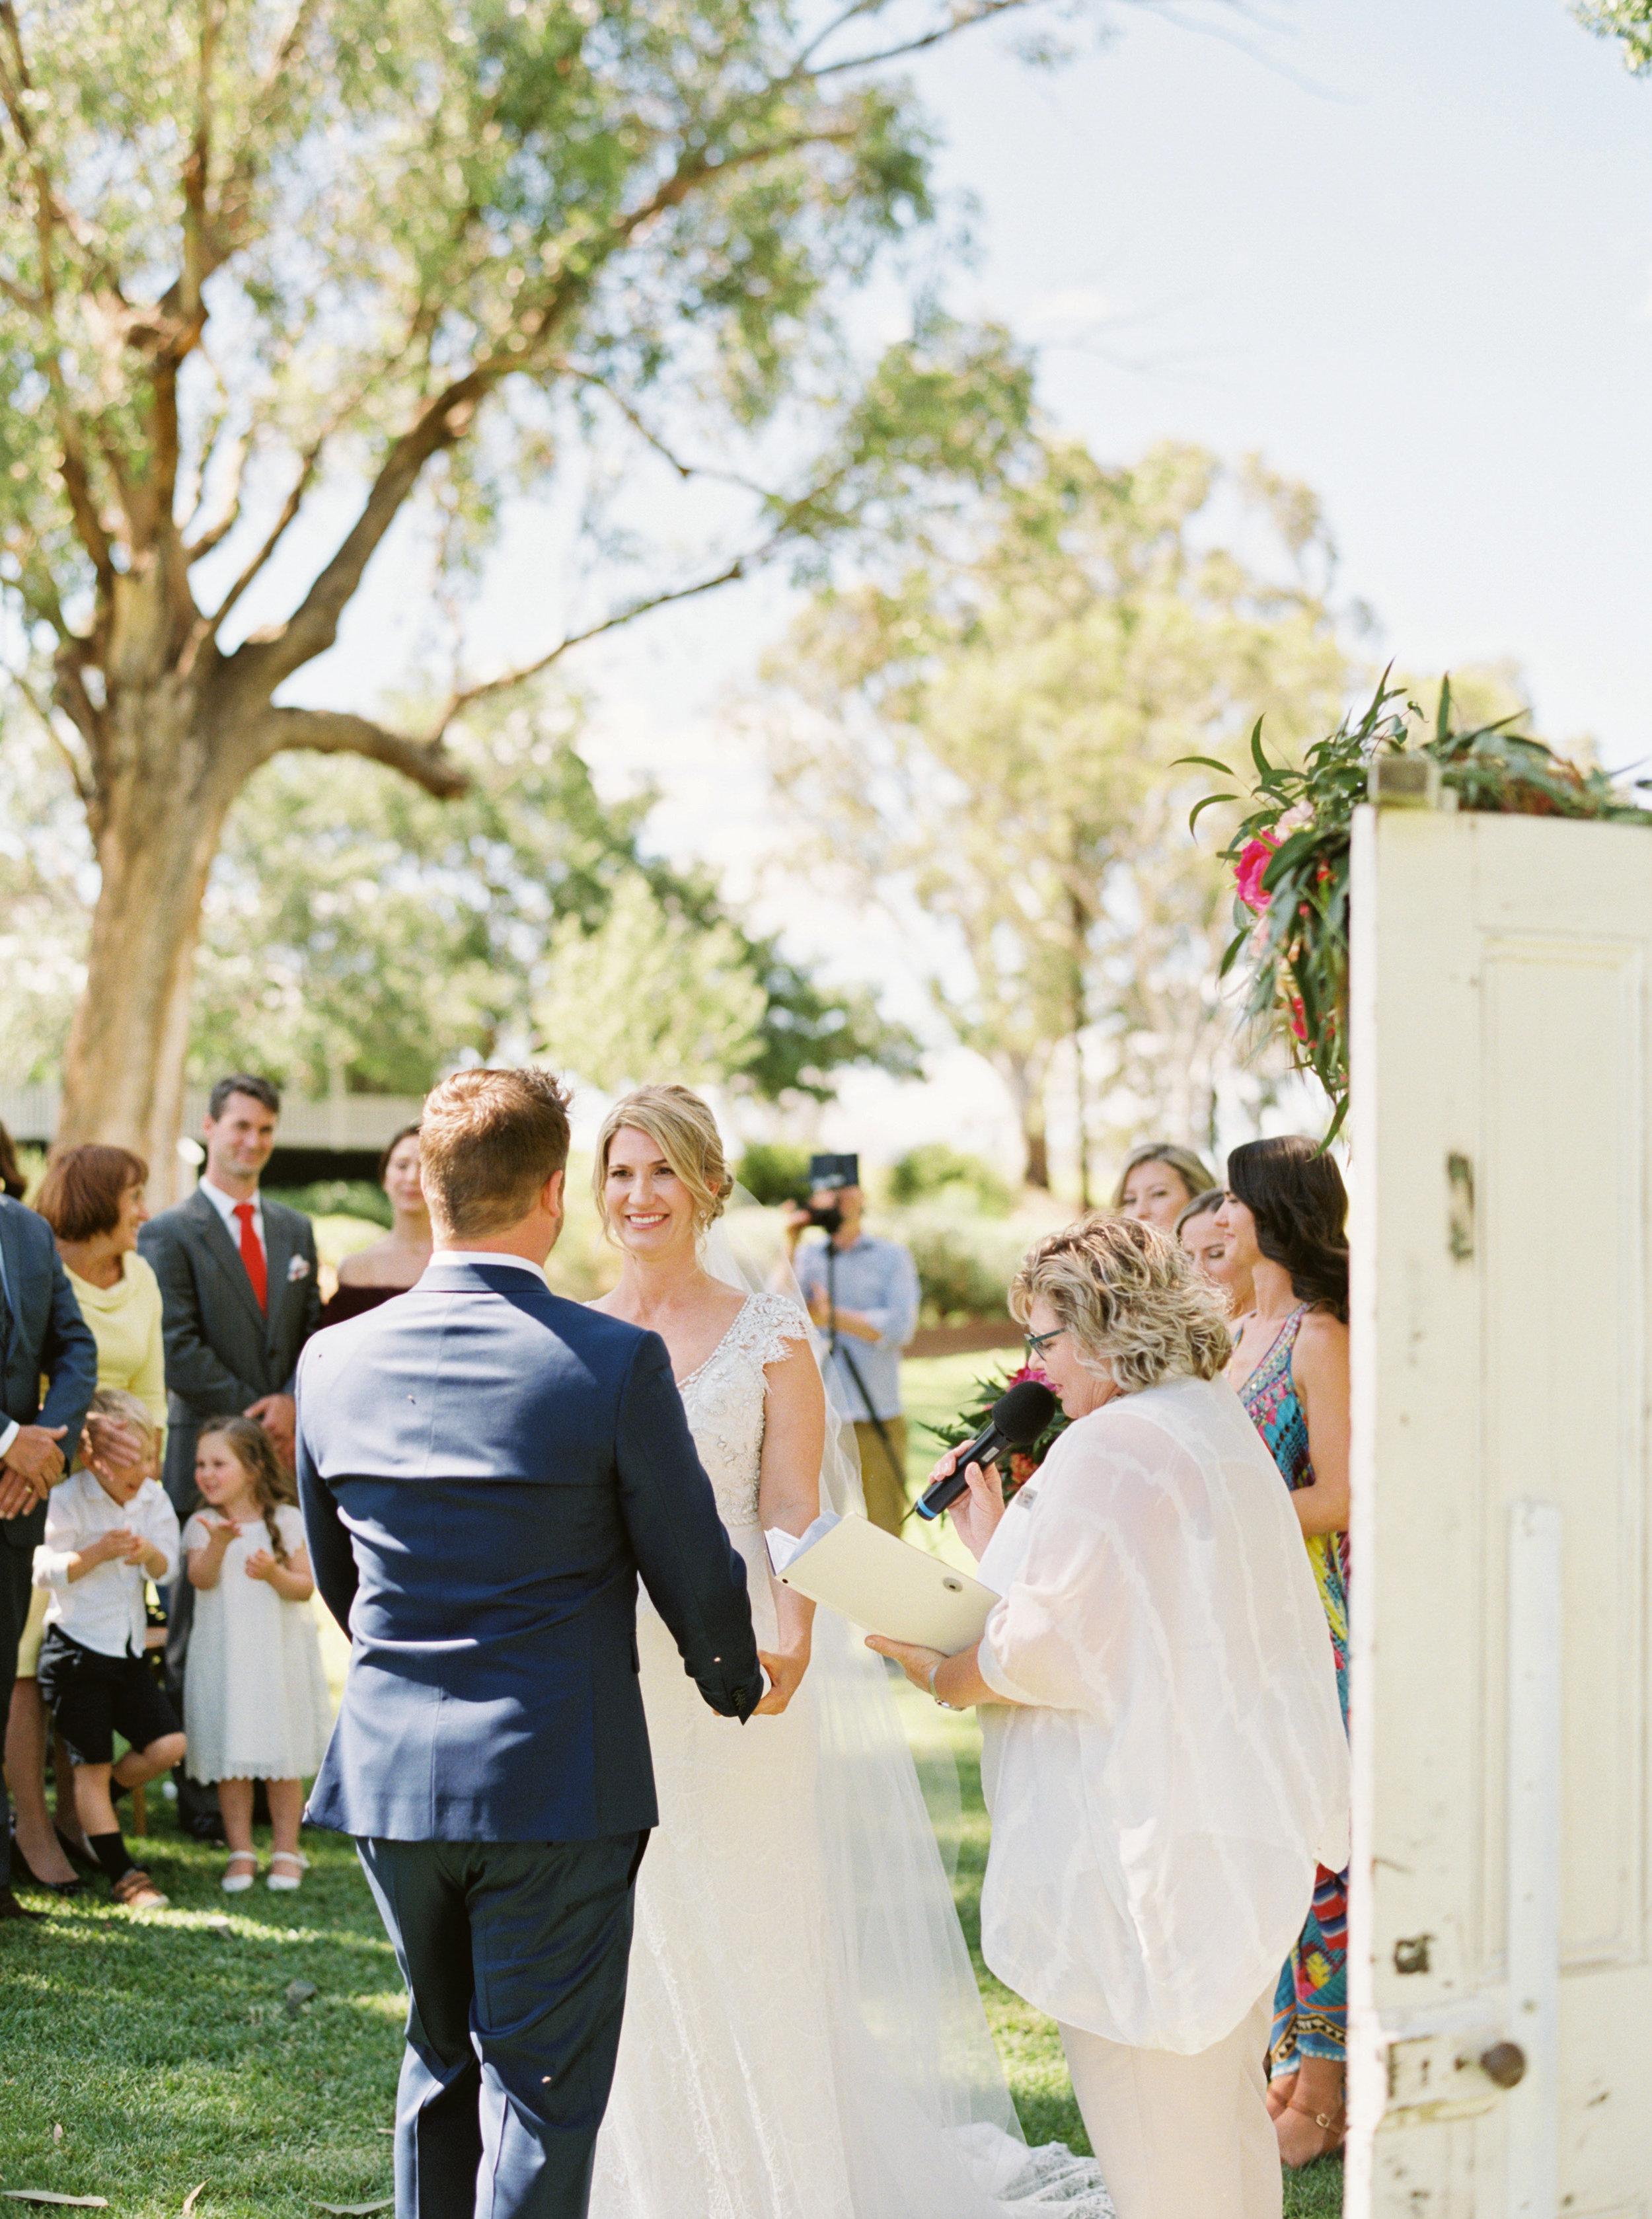 00051- Goonoo Goonoo Station Wedding Tamworth NSW Fine Art Film Wedding Photographer Sheri McMahon_-2.jpg